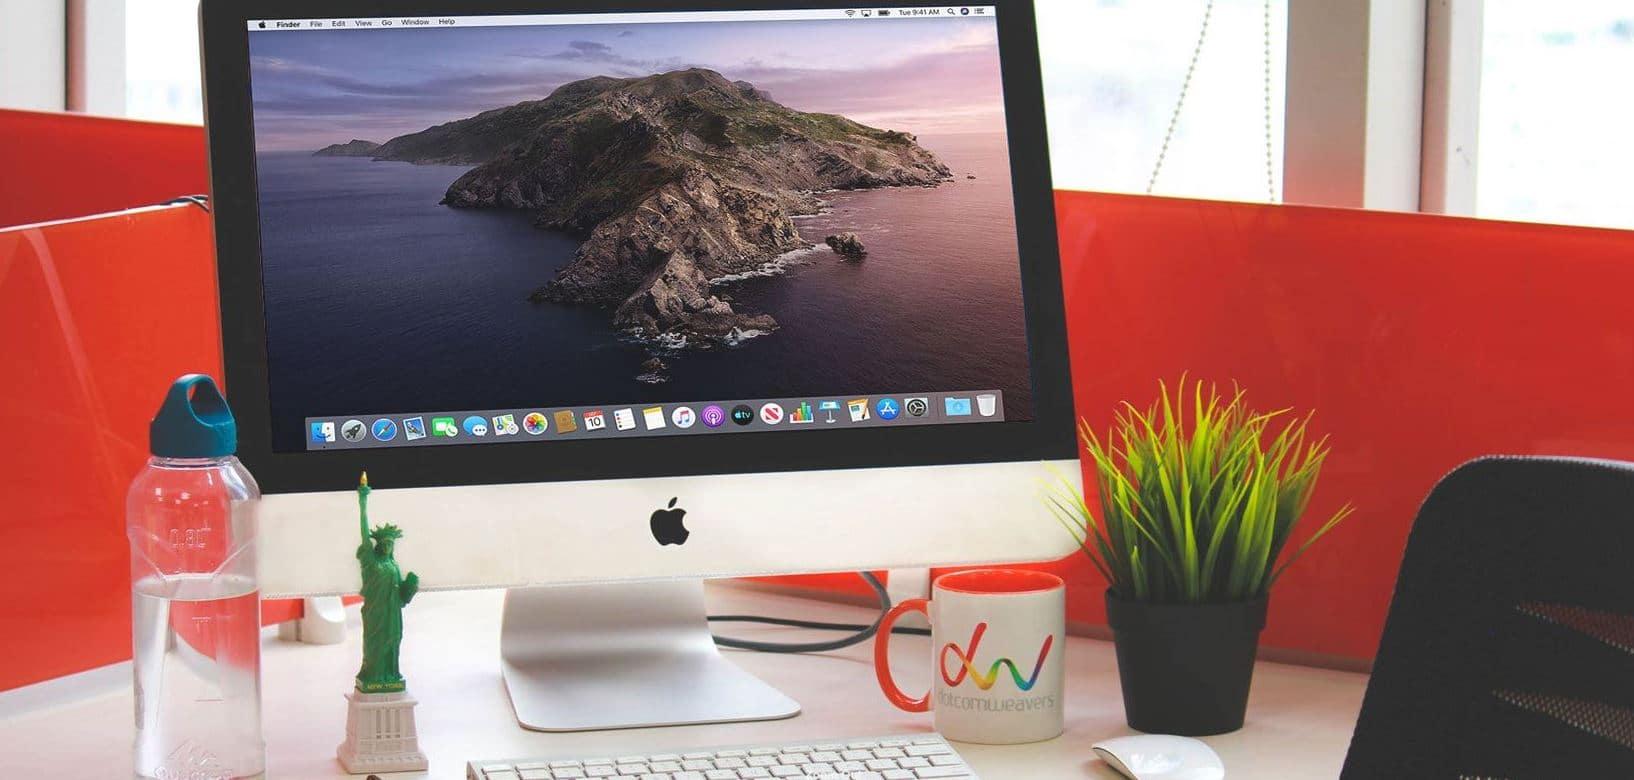 How to Speed Up macOS Catalina? 7 Easy Methods TechRechard